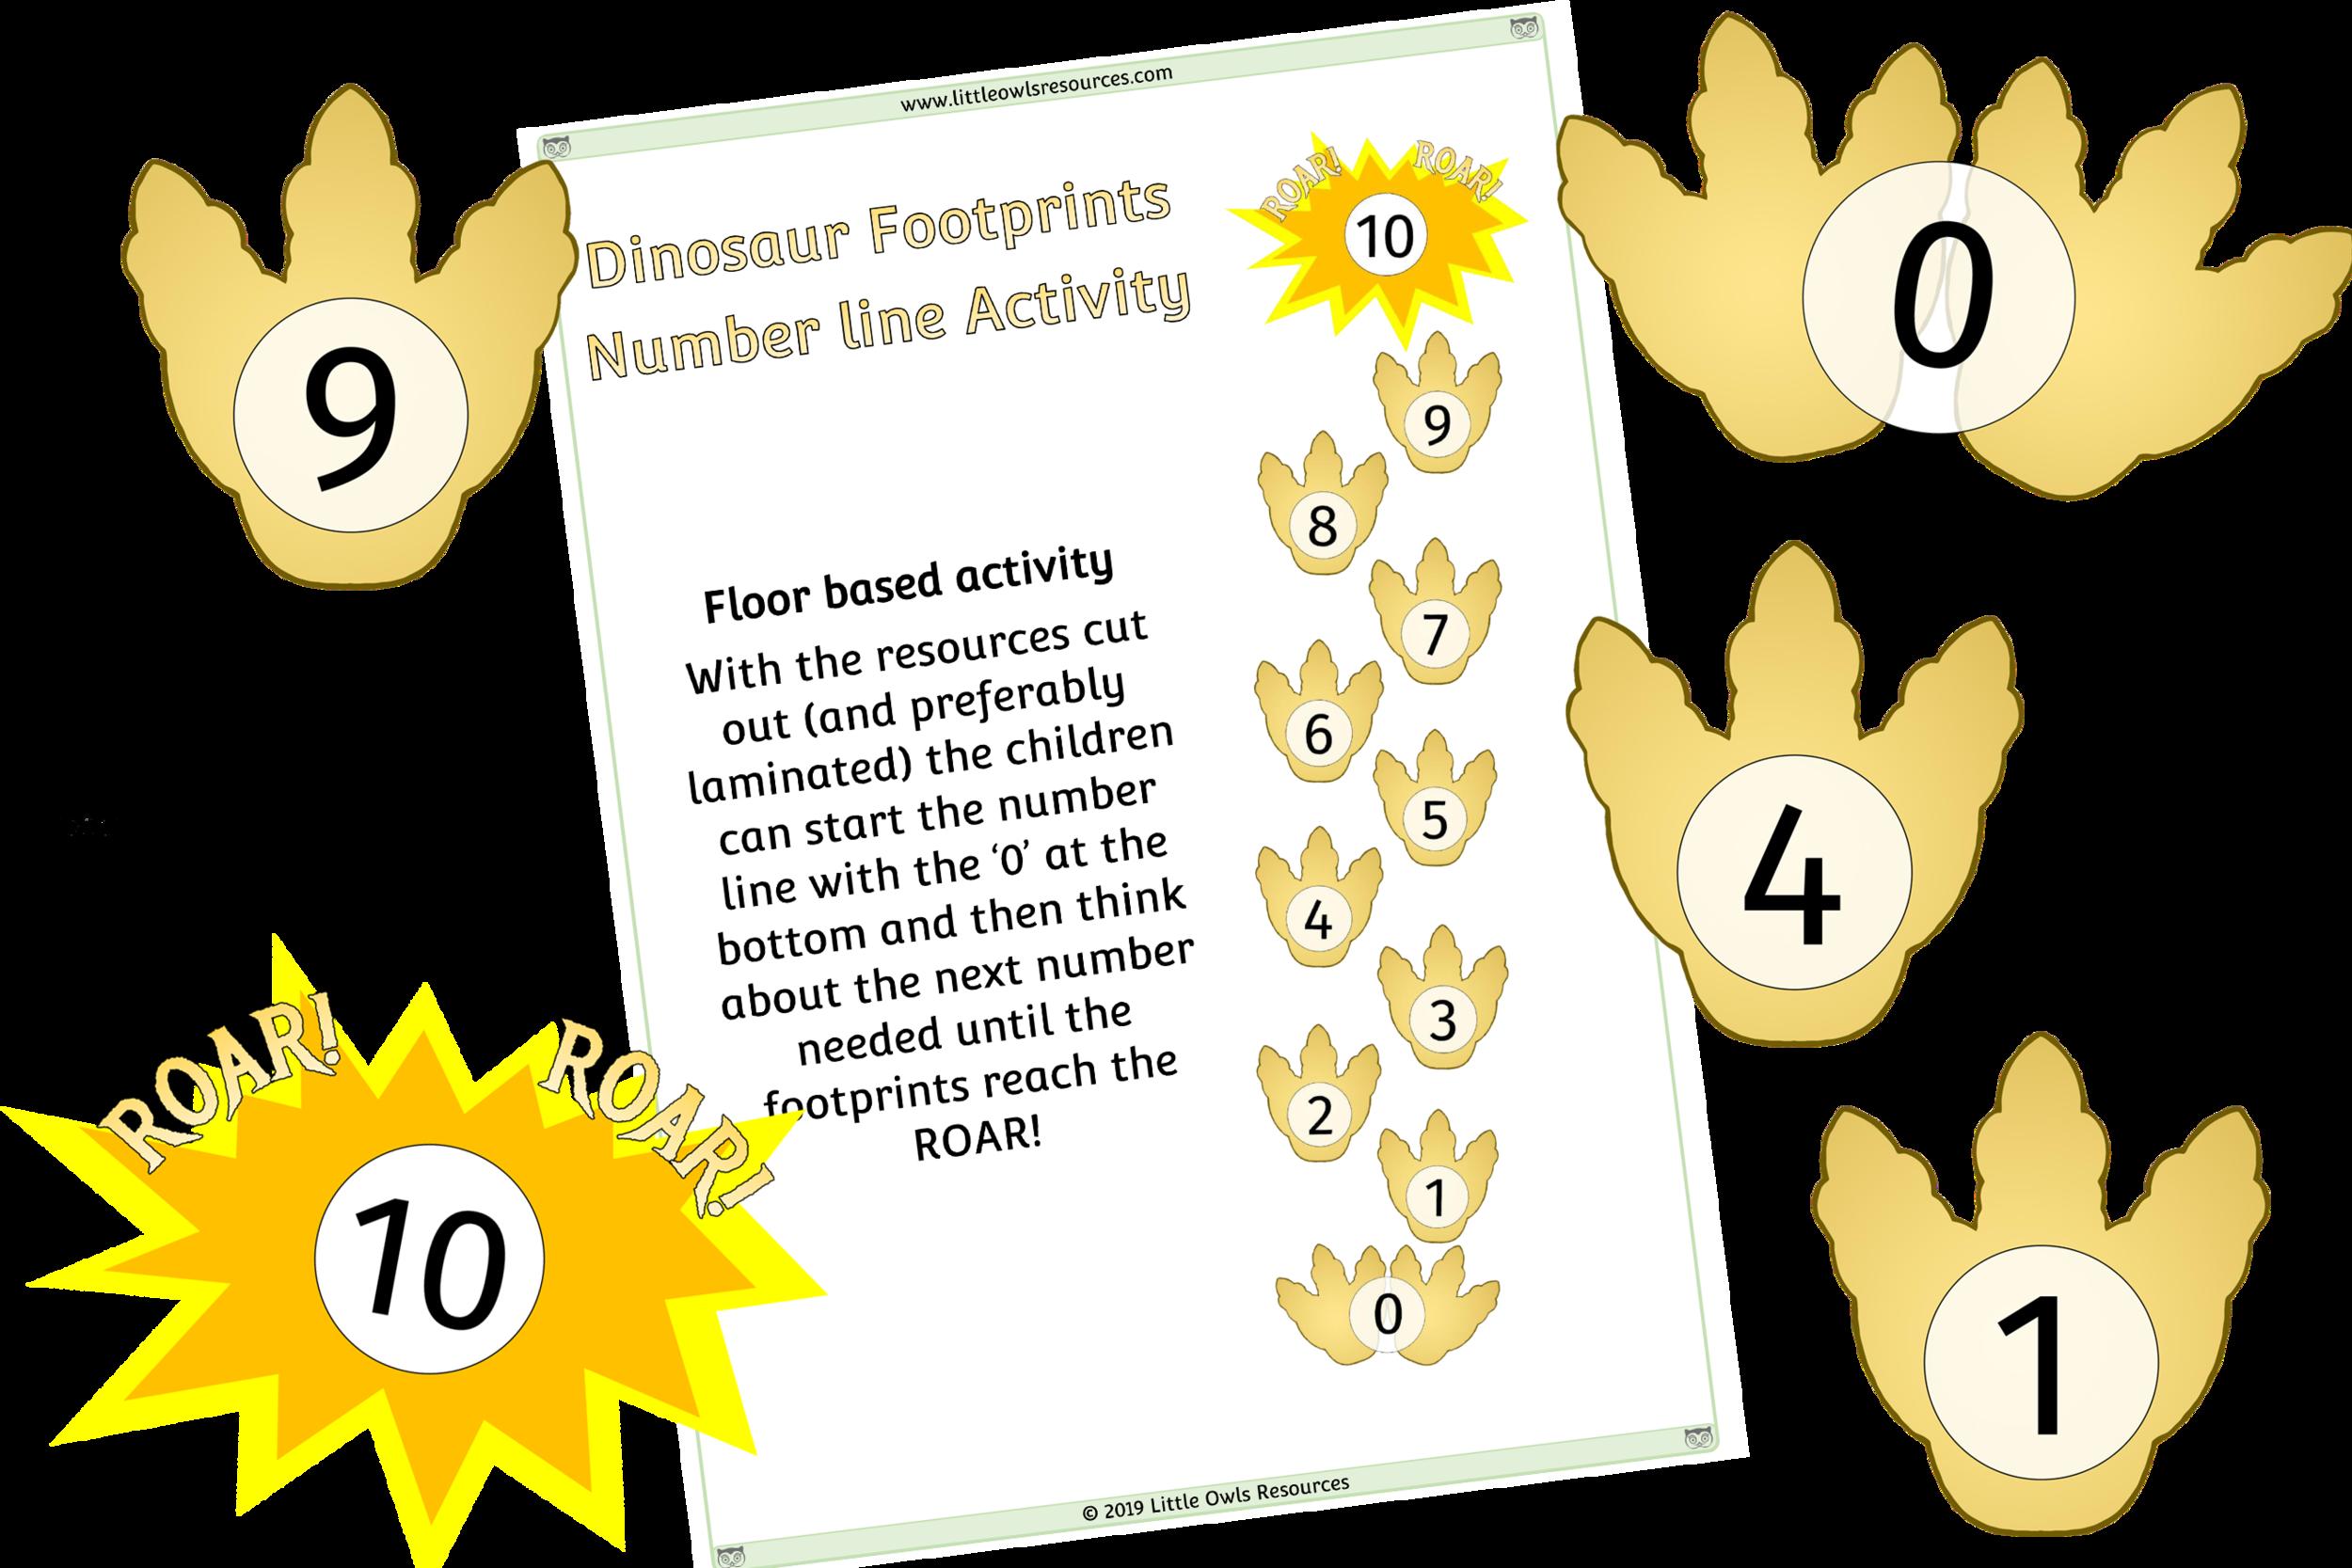 Dinosaur Footprint Number line Activity